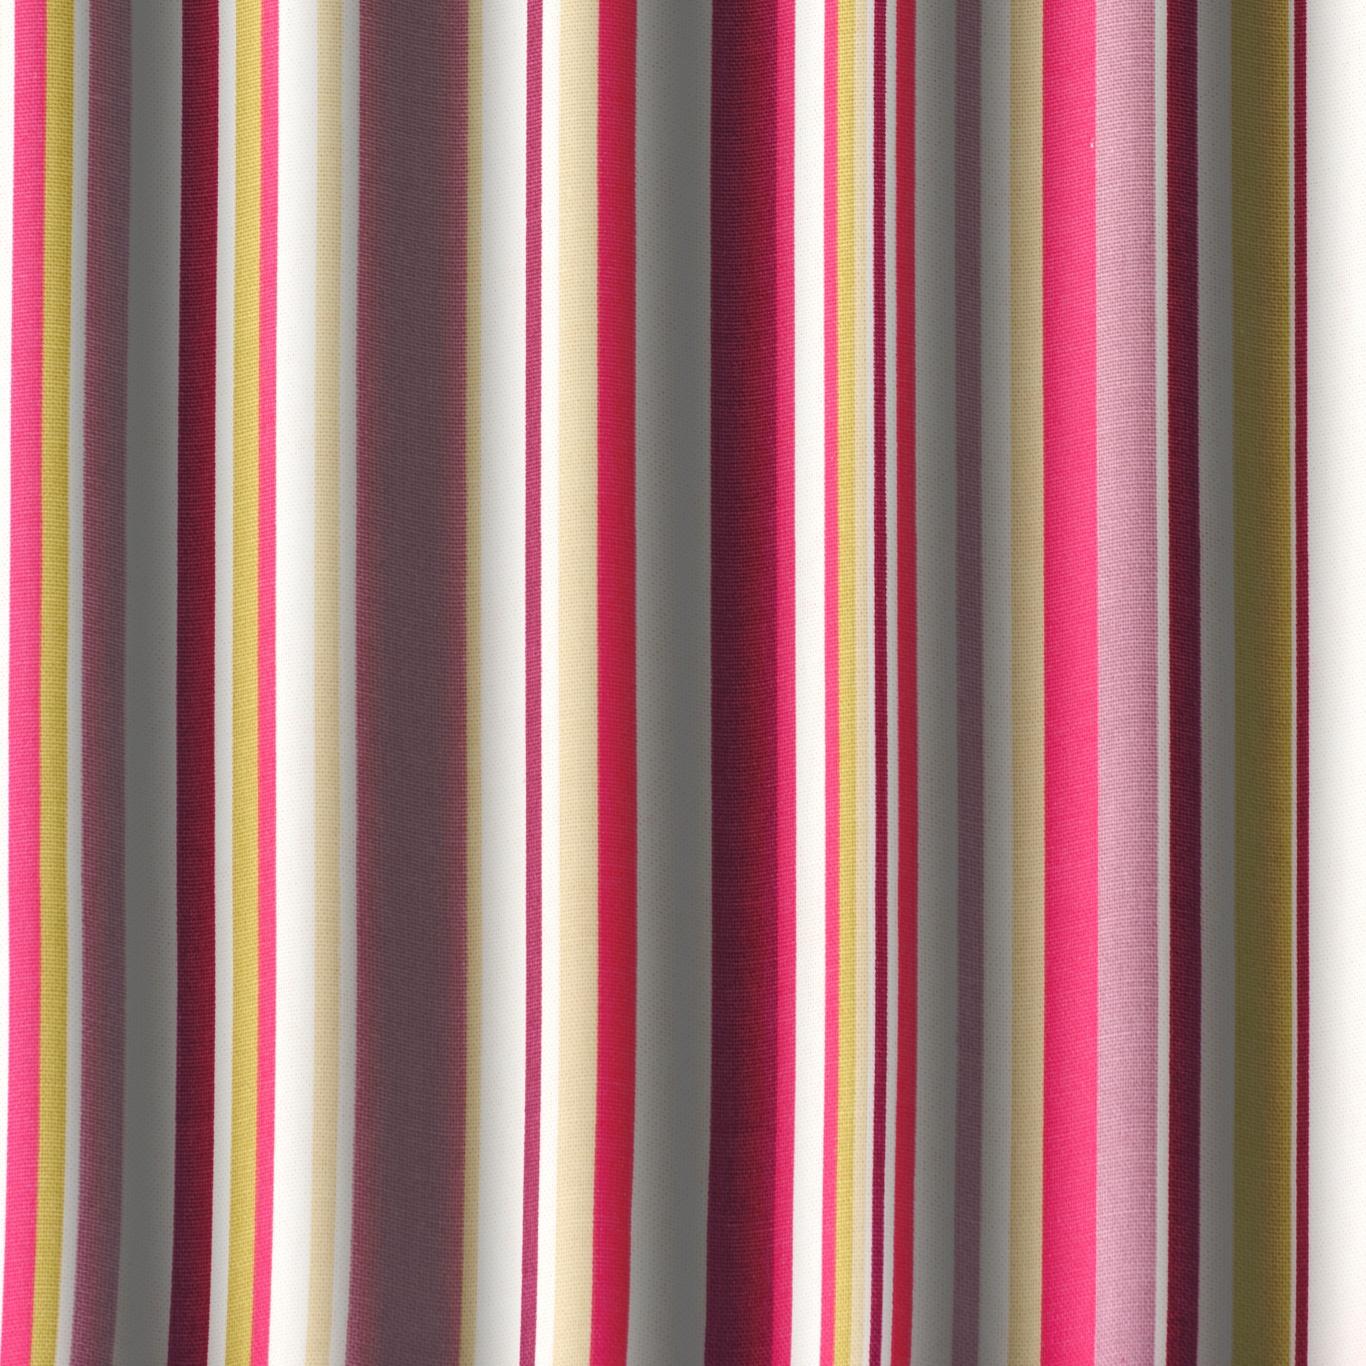 Gordon Smith Funky Stripe Purple Fabric 3m Remnant